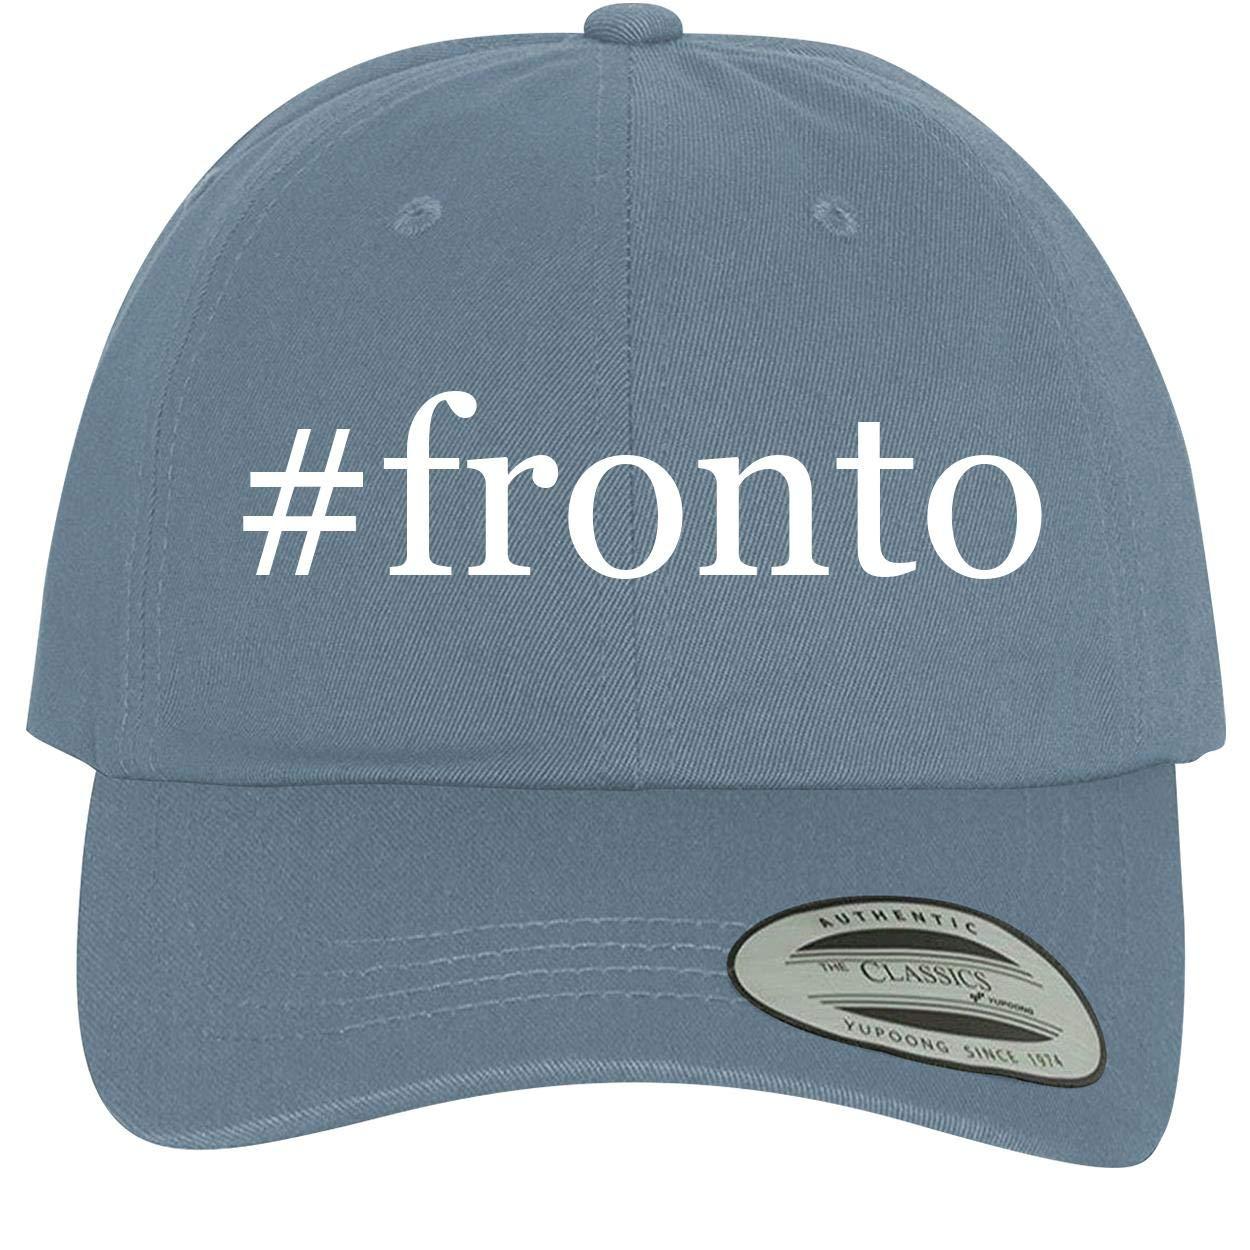 BH Cool Designs #Fronto Comfortable Dad Hat Baseball Cap